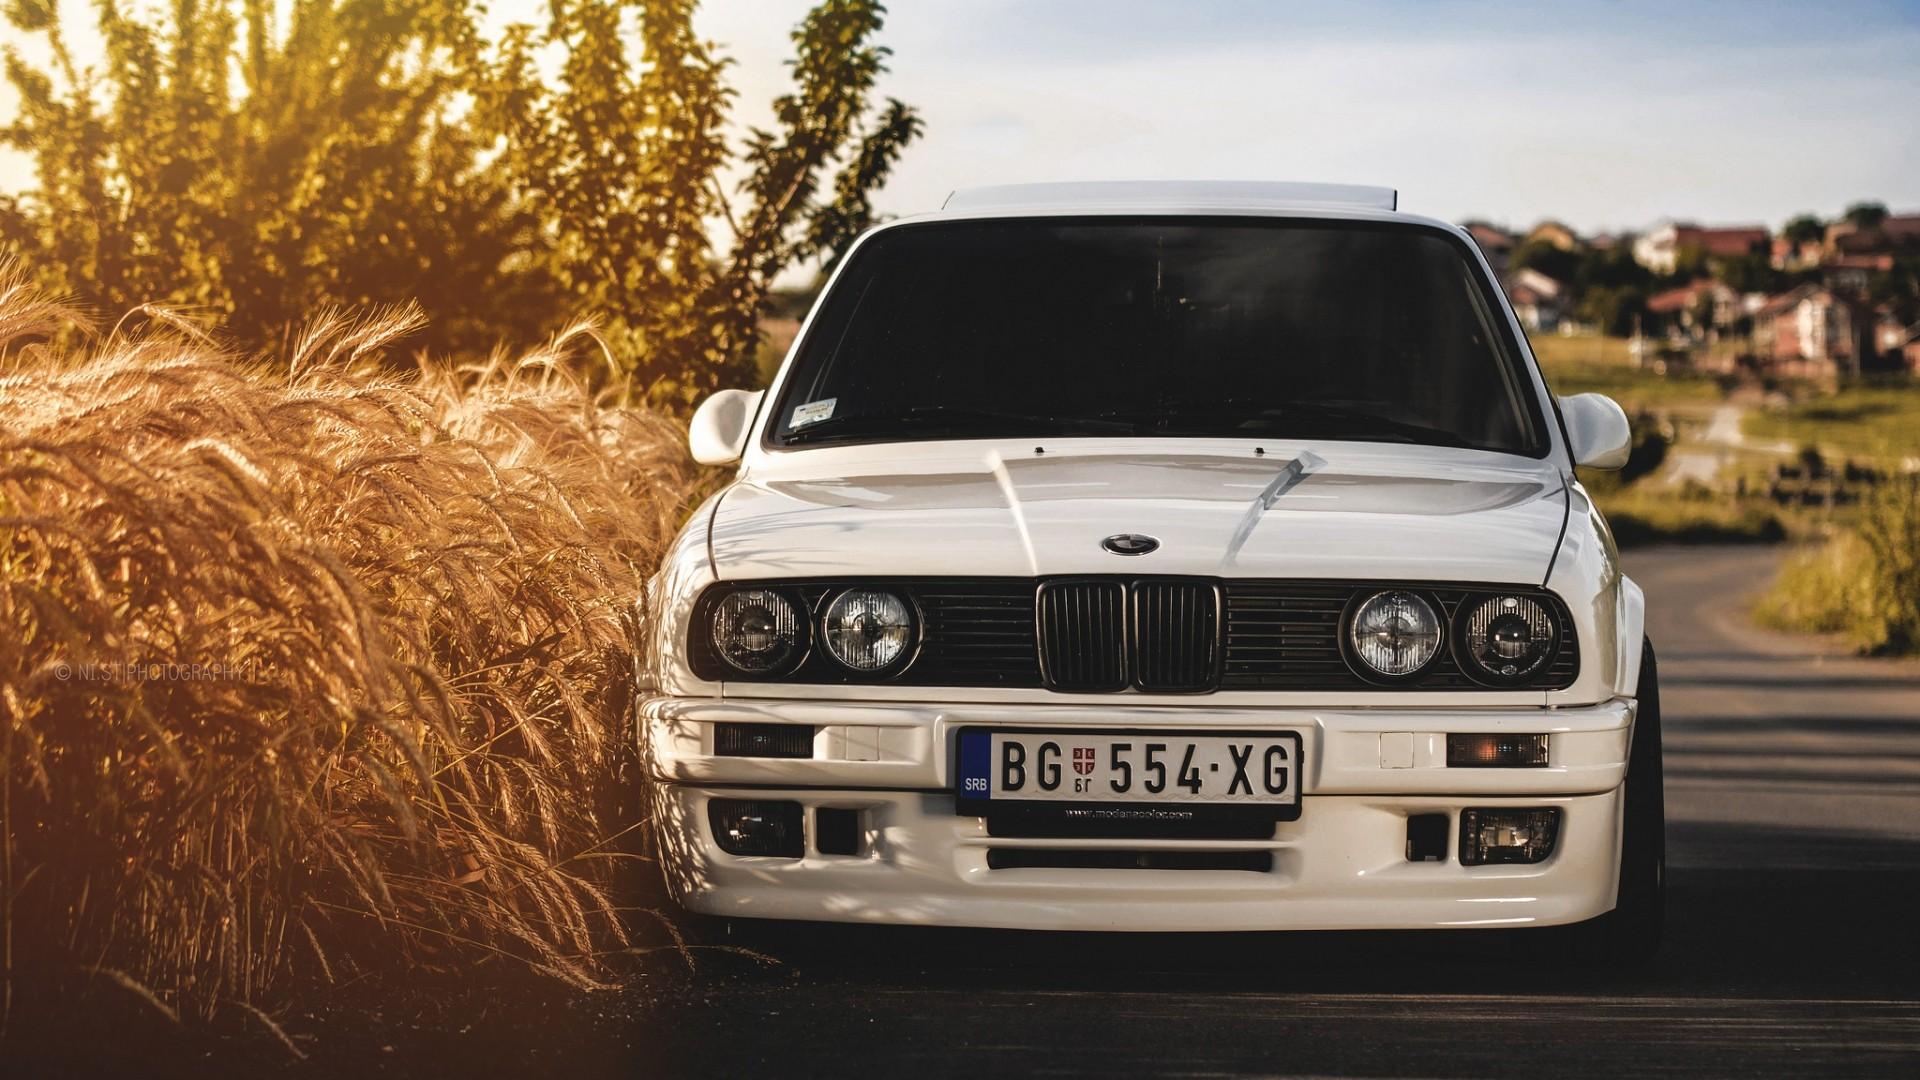 Luxurious Vw Sport Full Hd Car Wallpapers